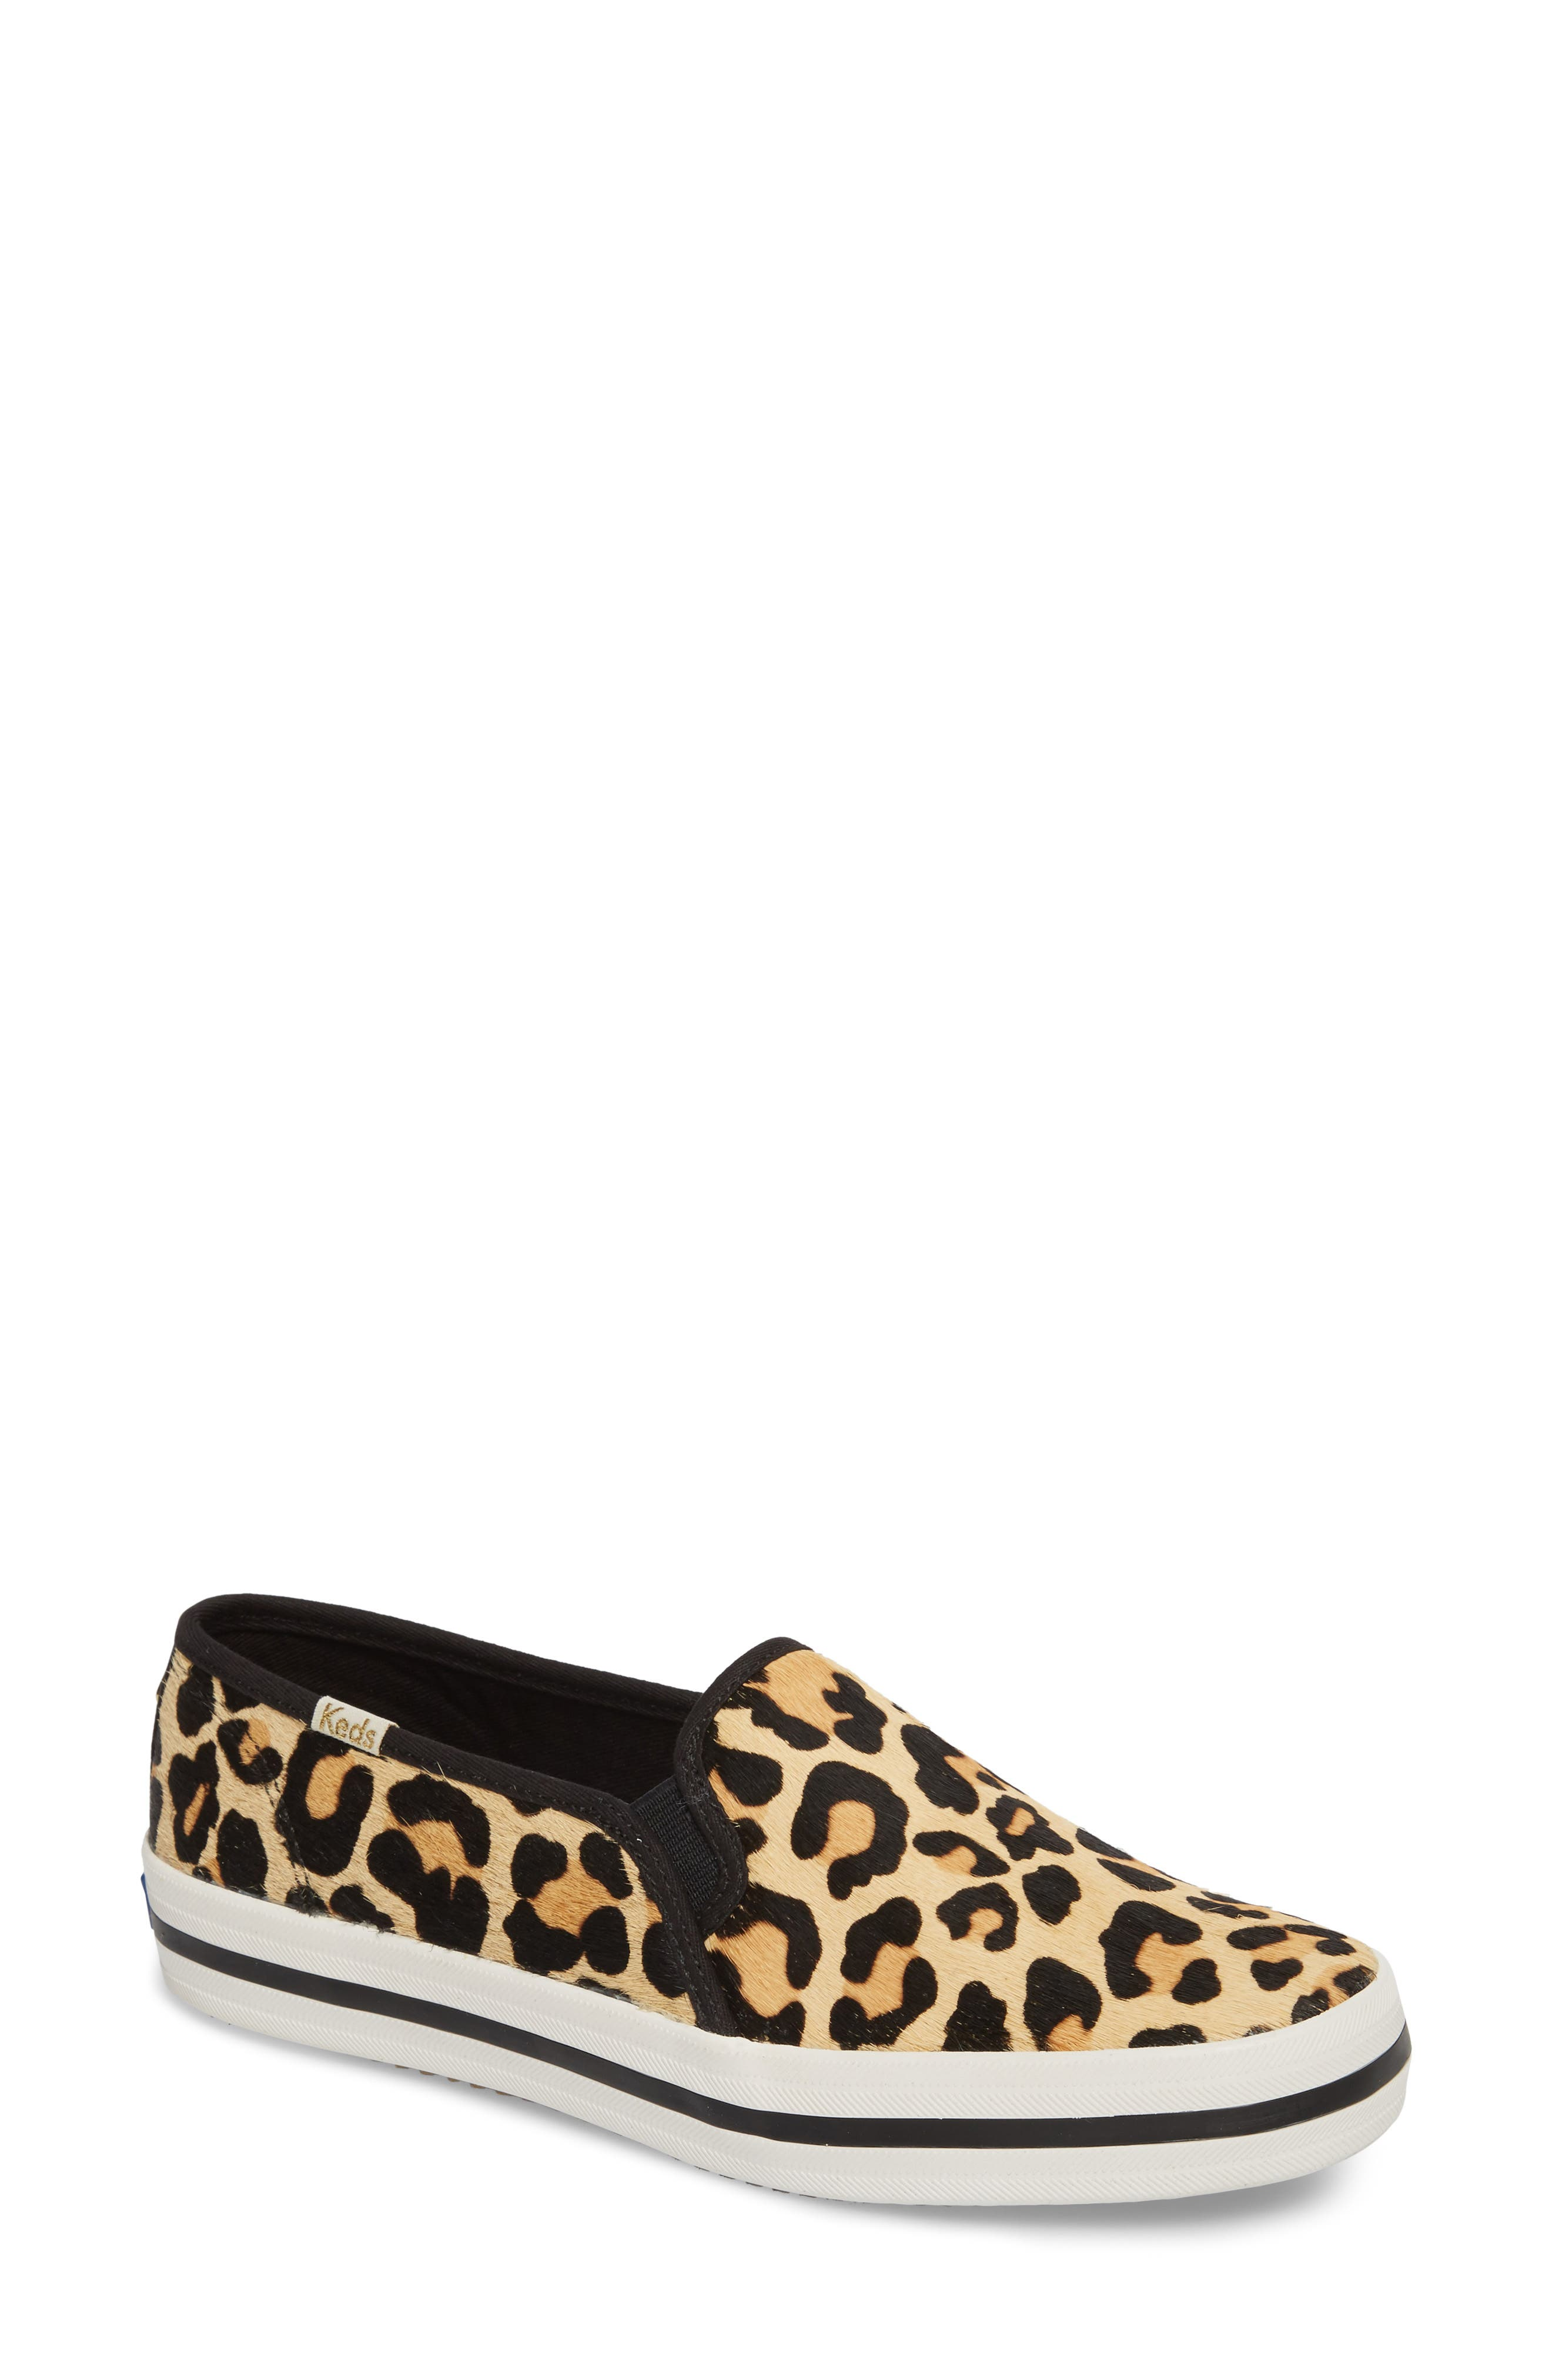 Keds<sup>®</sup> x kate spade Double Decker Slip-On Sneaker,                         Main,                         color, Tan Pony Hair